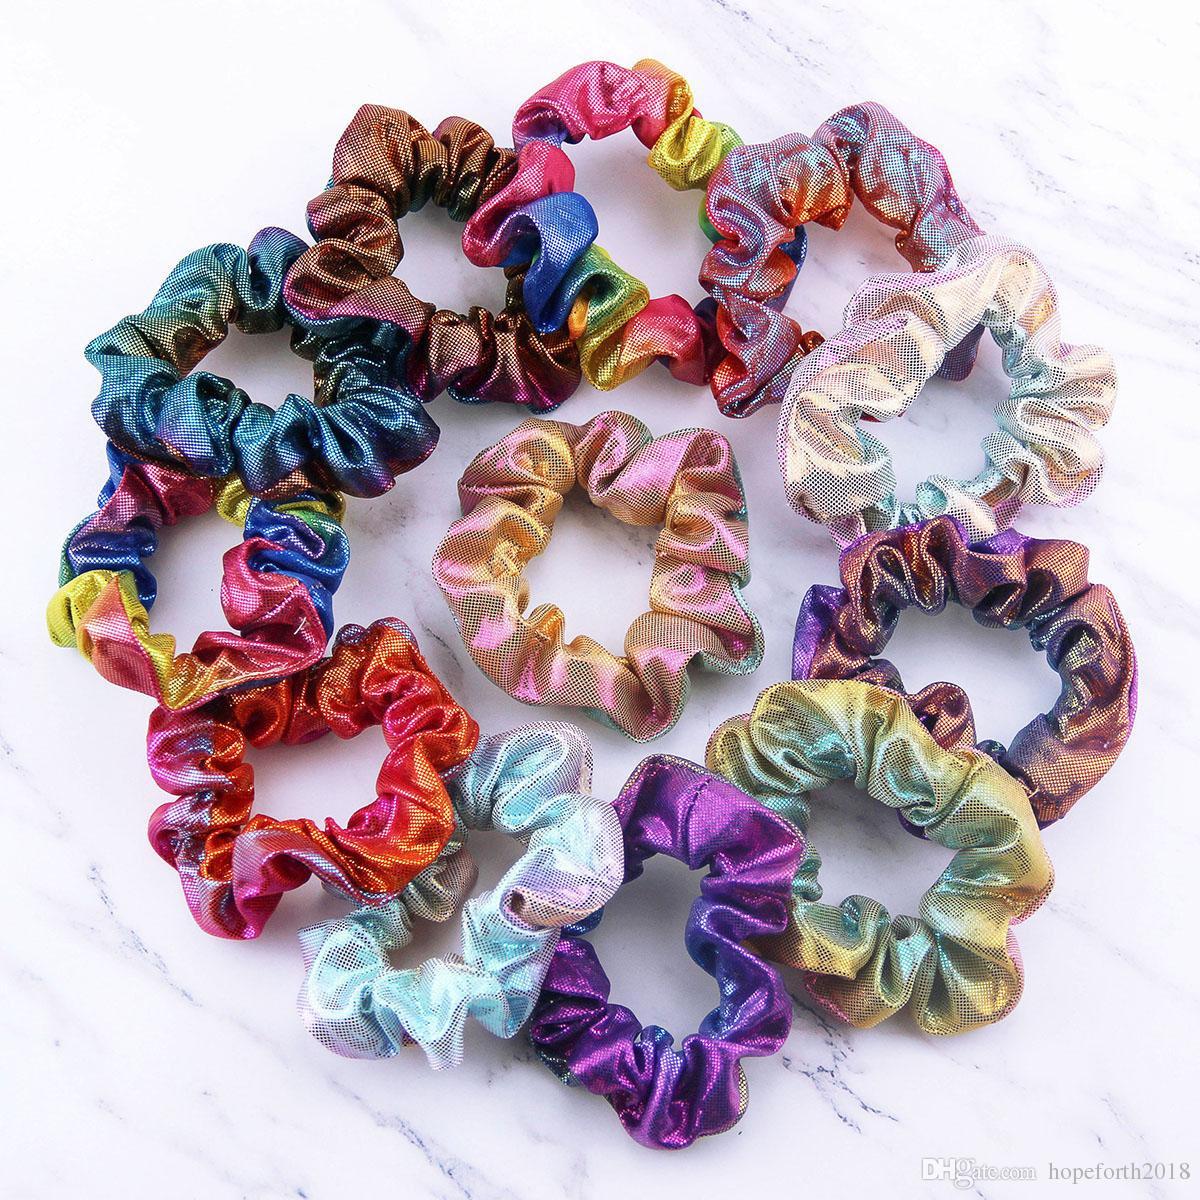 Hopeforth Women Mixed Colors Girl Kids Tiny Hair Bands Elastic Ties  Ponytail Holder Headband Hair Bands Headband Hair Piece Headband For Hair  From ... a8a4da9ac5b